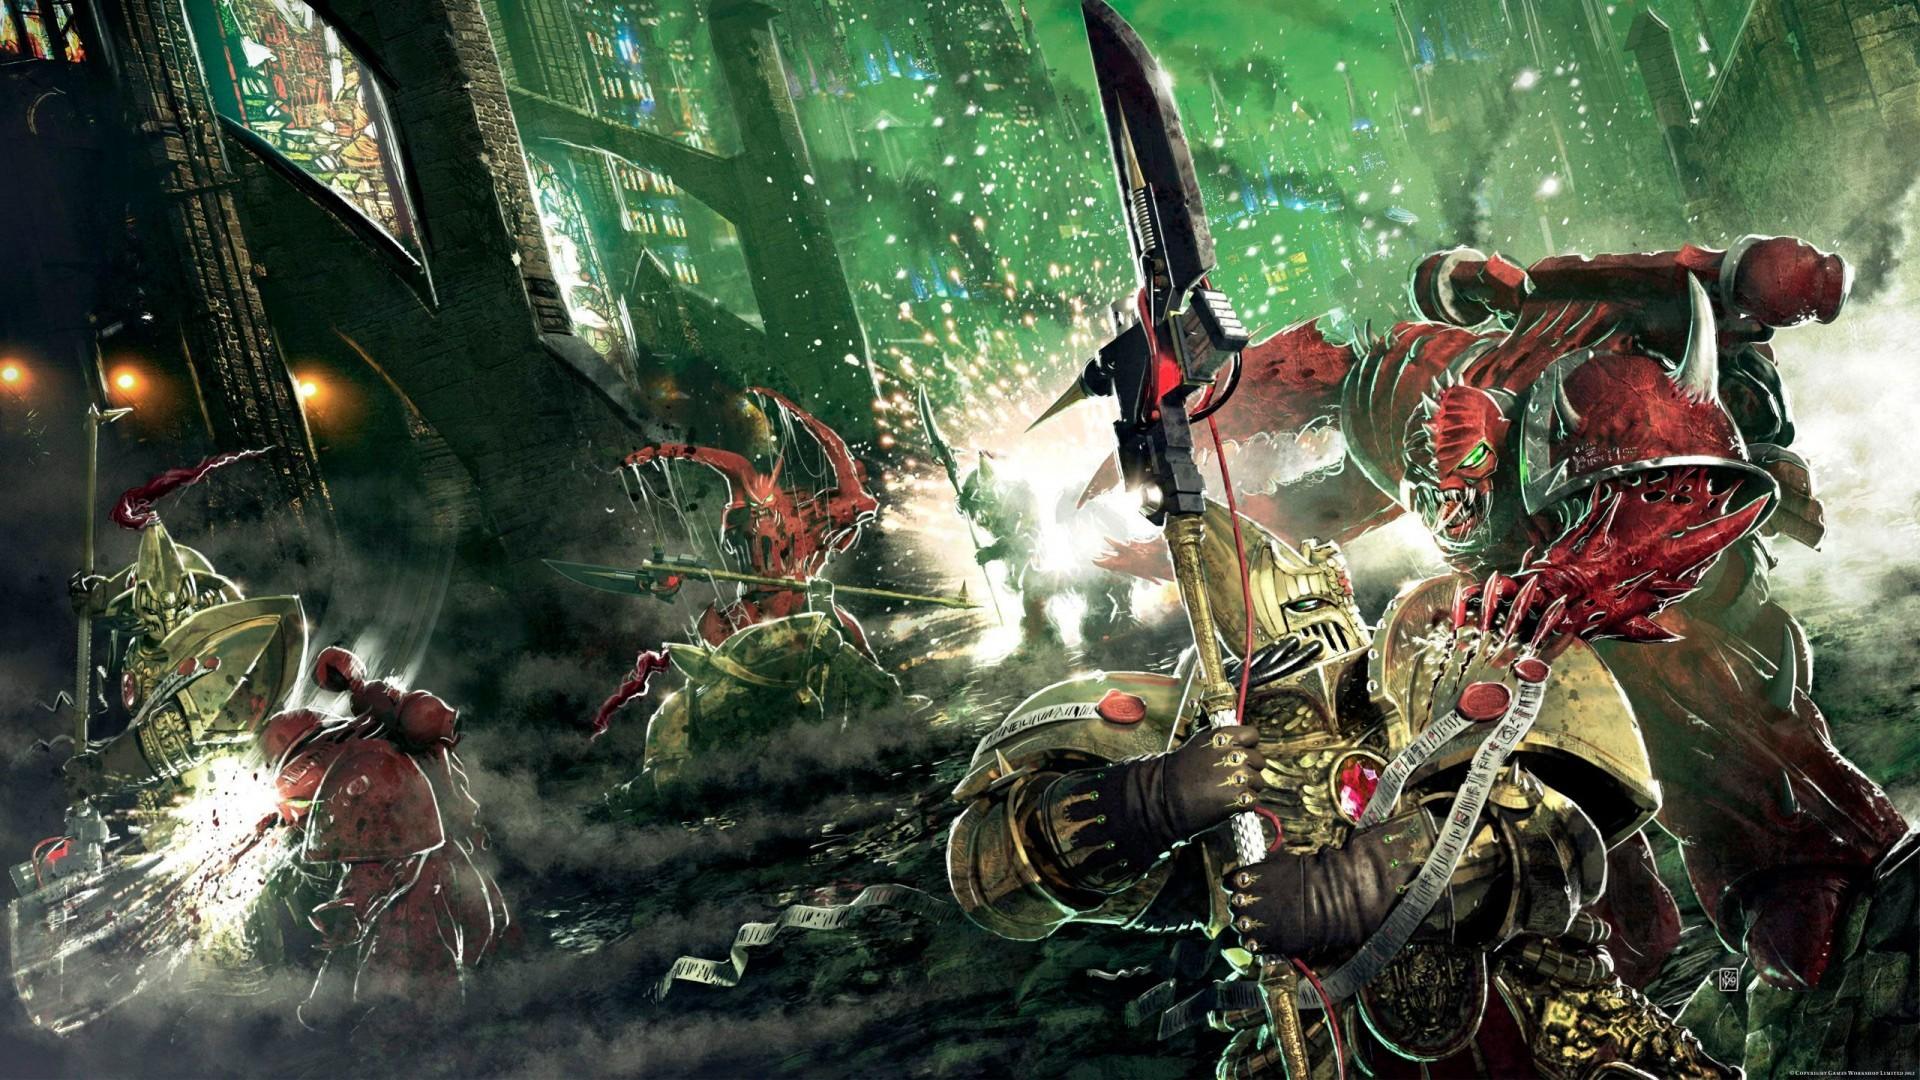 Greenskins intercepting their own Waaagh! army! — Total War Forums